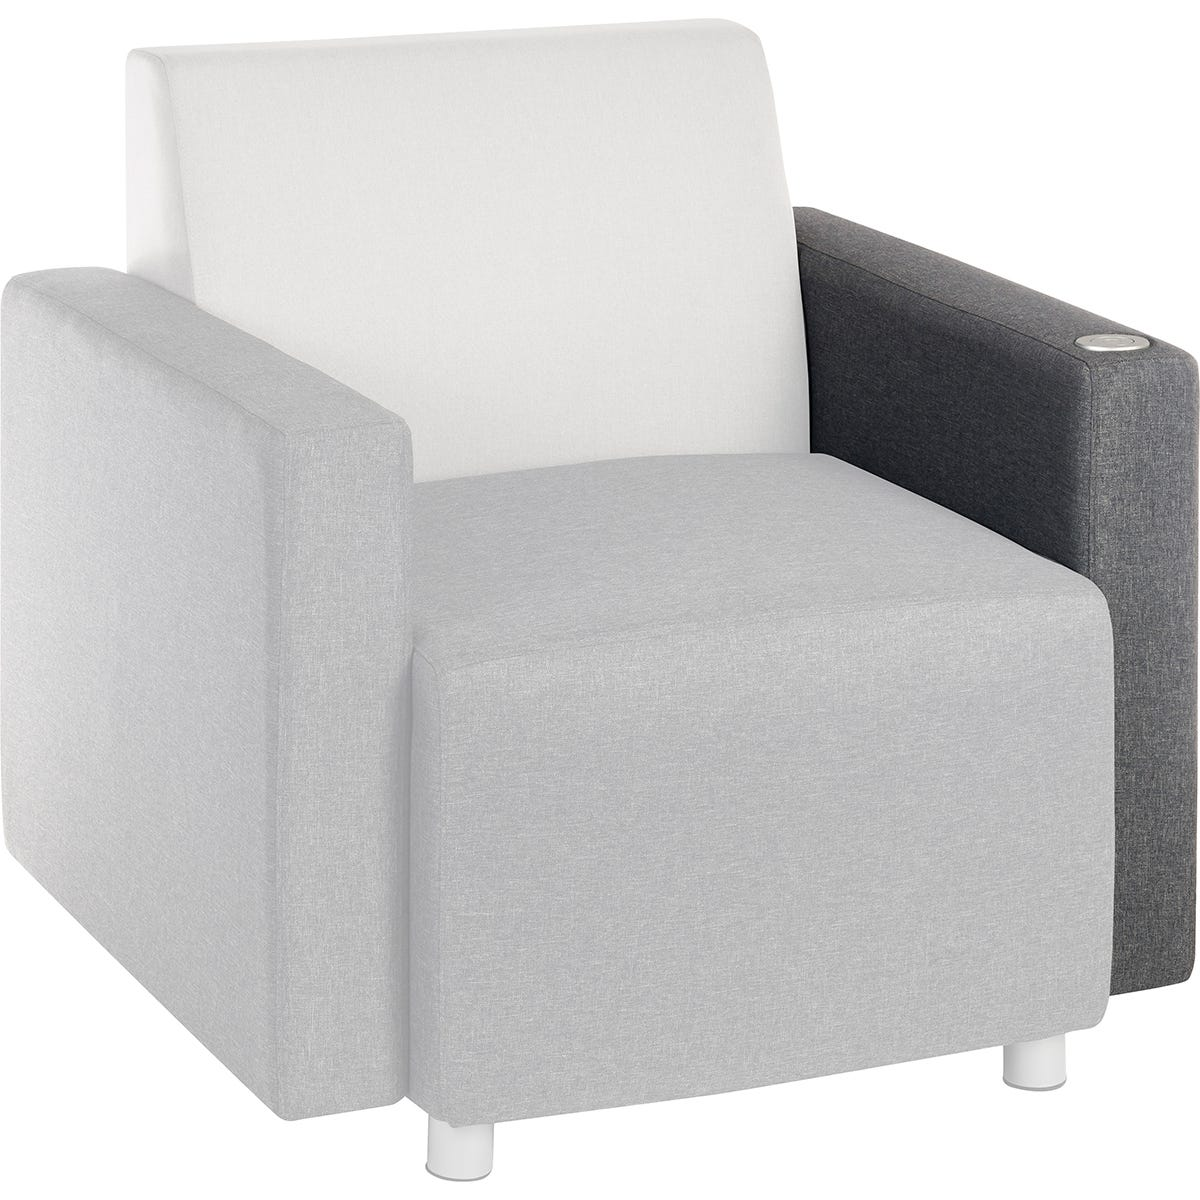 Teknik Cube Modular Reception Sofa - Dark Grey Left Hand Chair